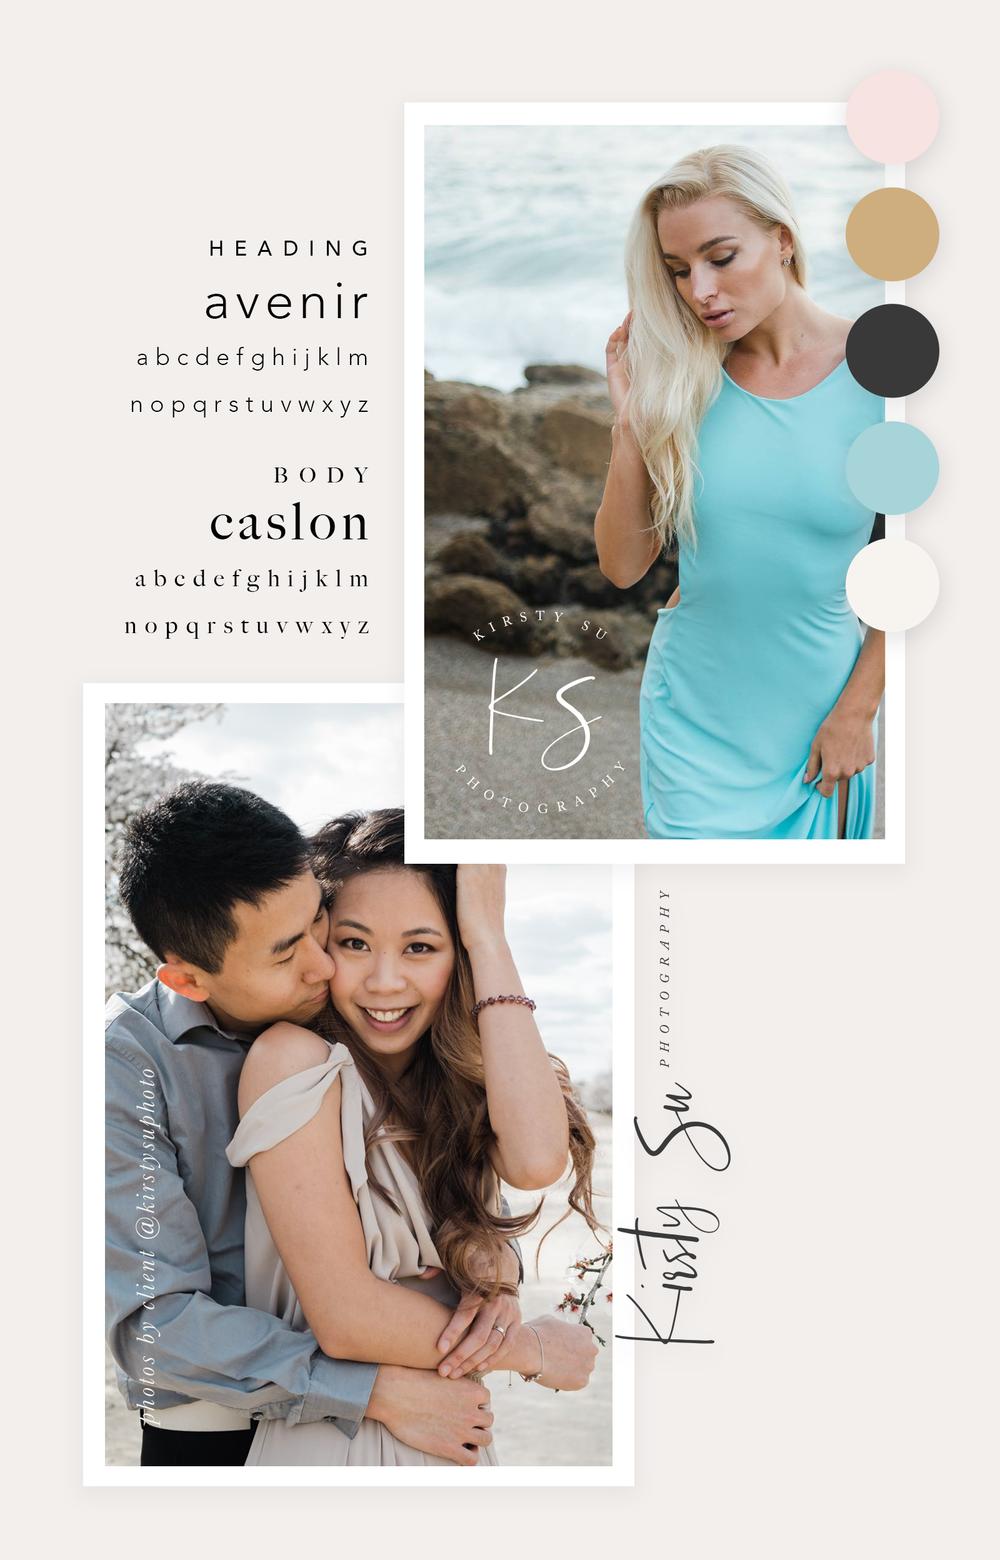 Kirsty Su Photography | Branding and Graphic Design for Female Entrepreneurs | Brand Identity Design | Branding Color Palette | Brand Design Inspiration | Brand Board | Color Palette Inspiration | Minimalist Brand Design | Branding Board | Logo Design Inspiration | Visual Identity | Brand Guidelines | Molly Ho Studio